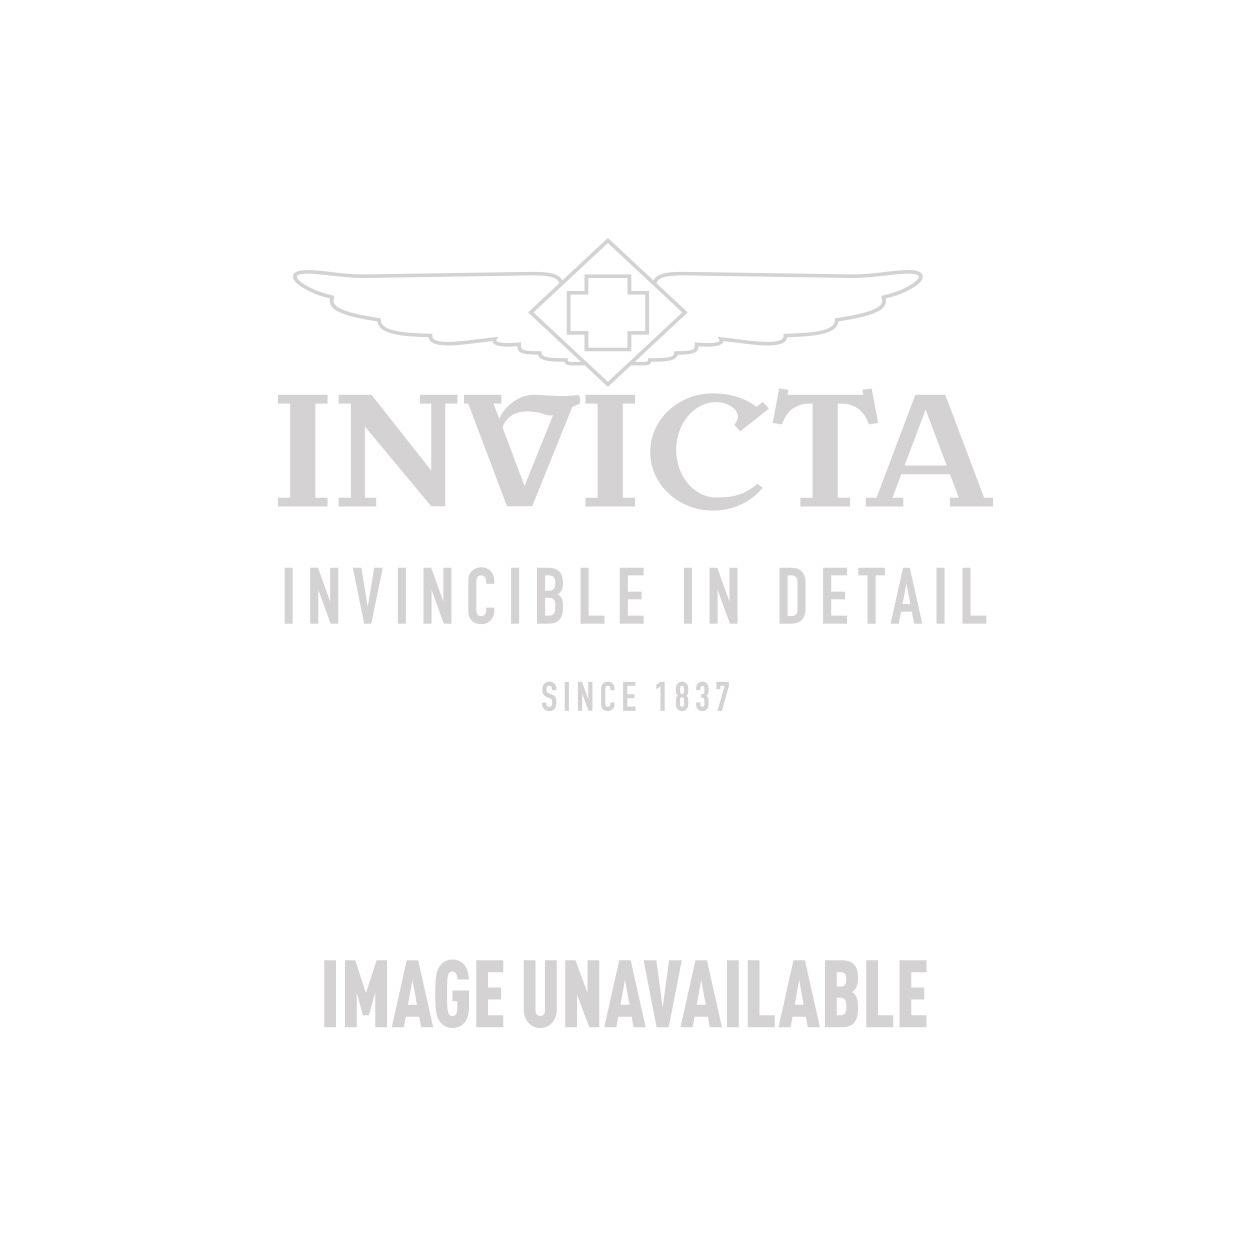 Invicta Speedway Quartz Watch - Black, Stainless Steel case Stainless Steel band - Model 10701